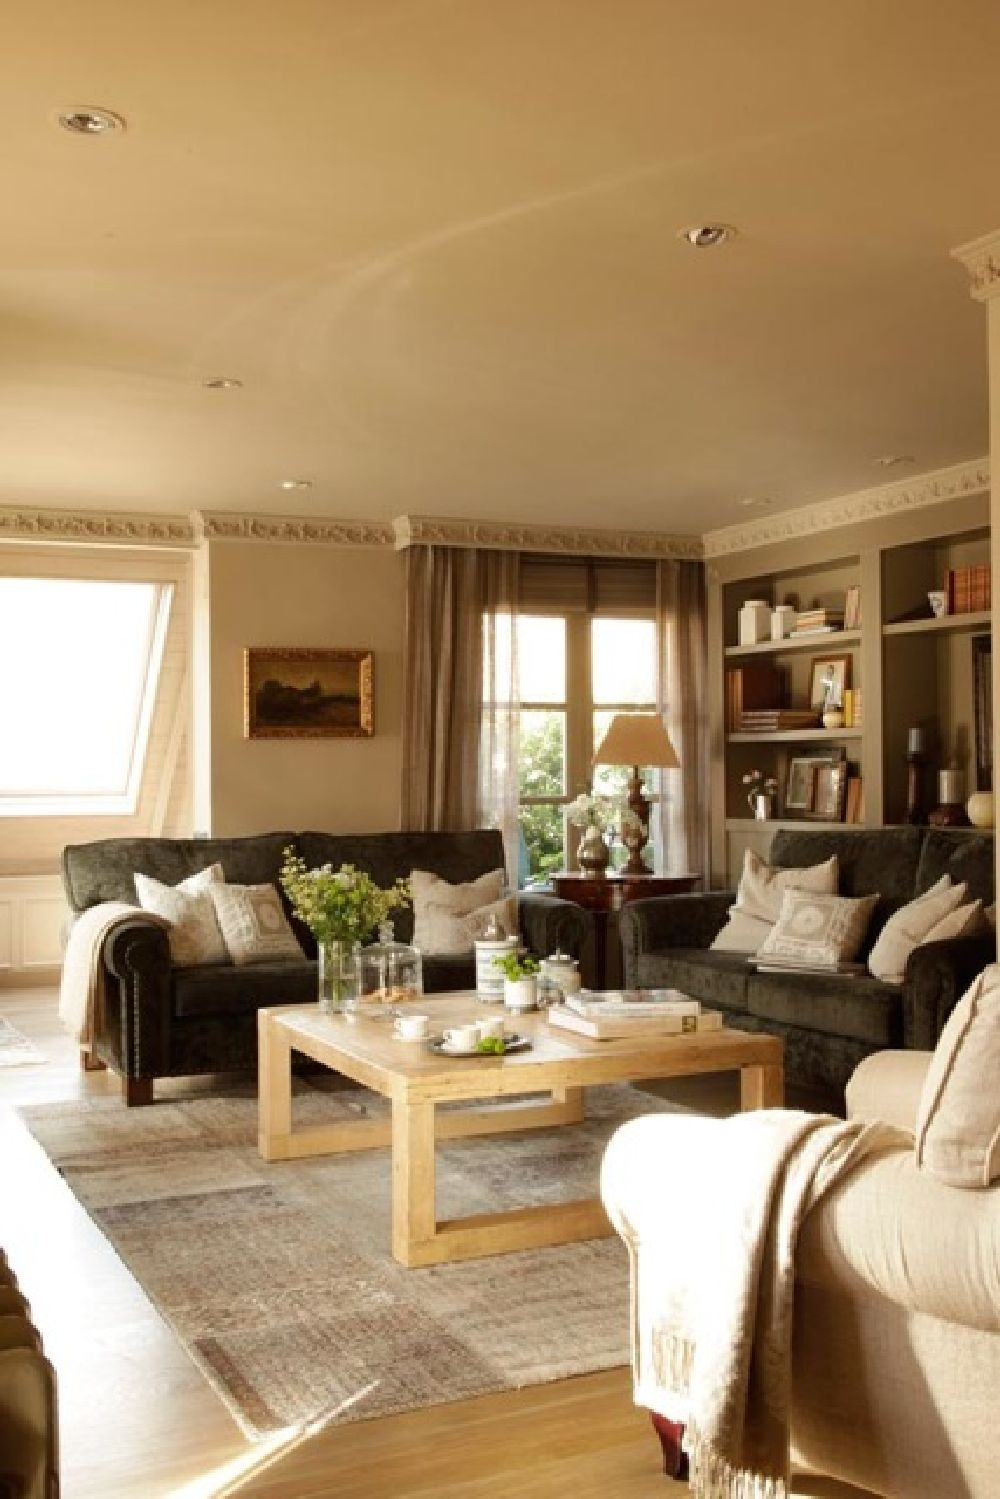 adelaparvu.com despre locuinta parter si mansarda in stil combinat clasic si rustic, designer Jeanette Tresing, Foto Jeanette Tresing (9)